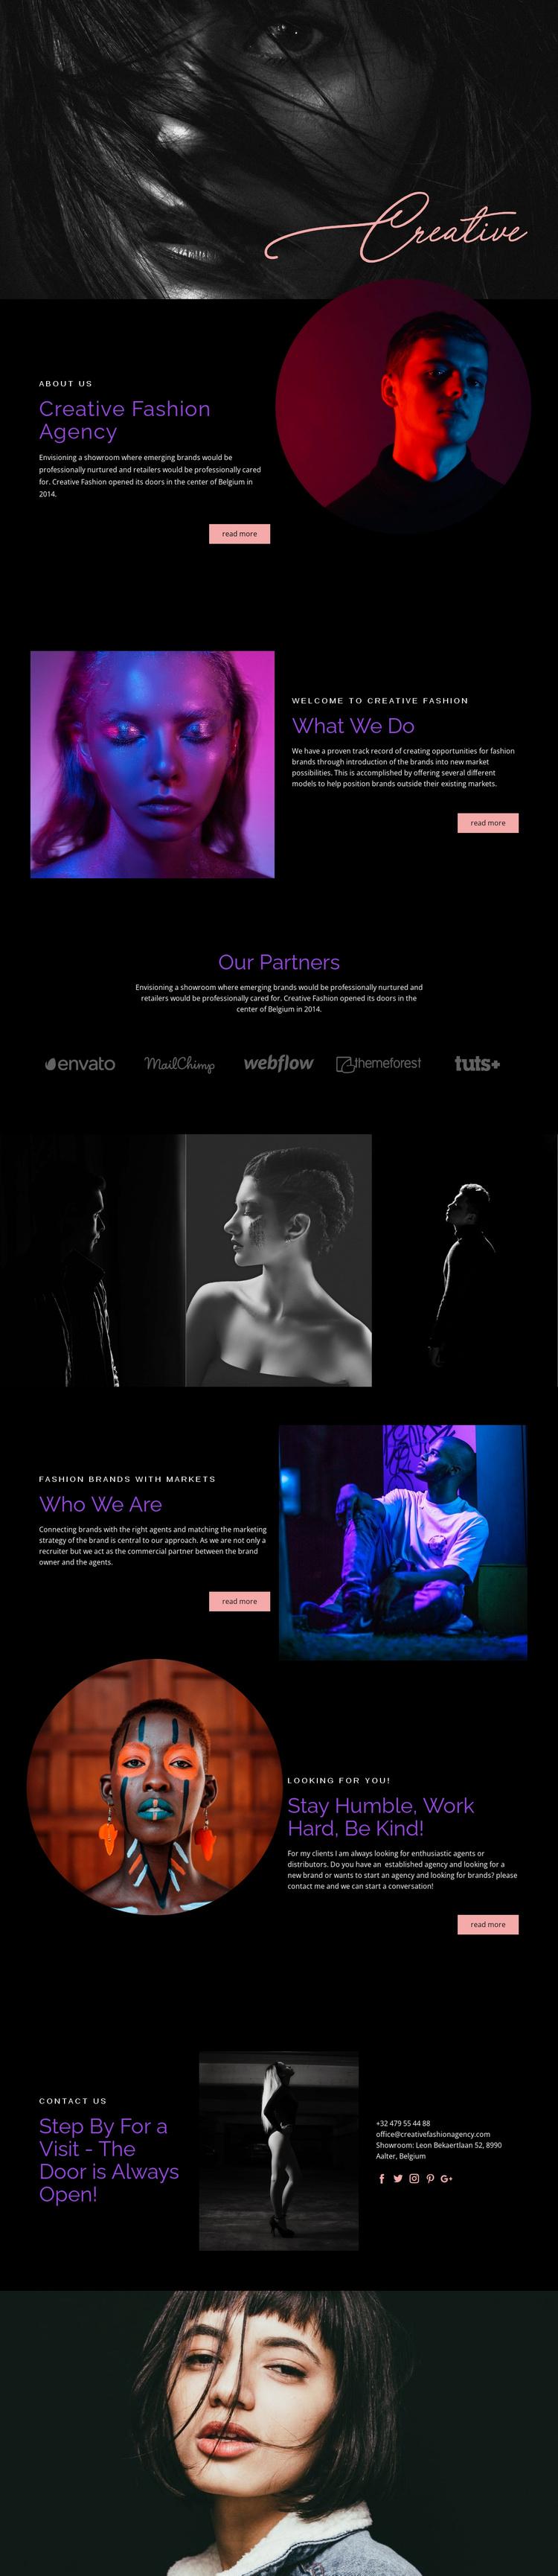 Creative Fashion Agency Website Template